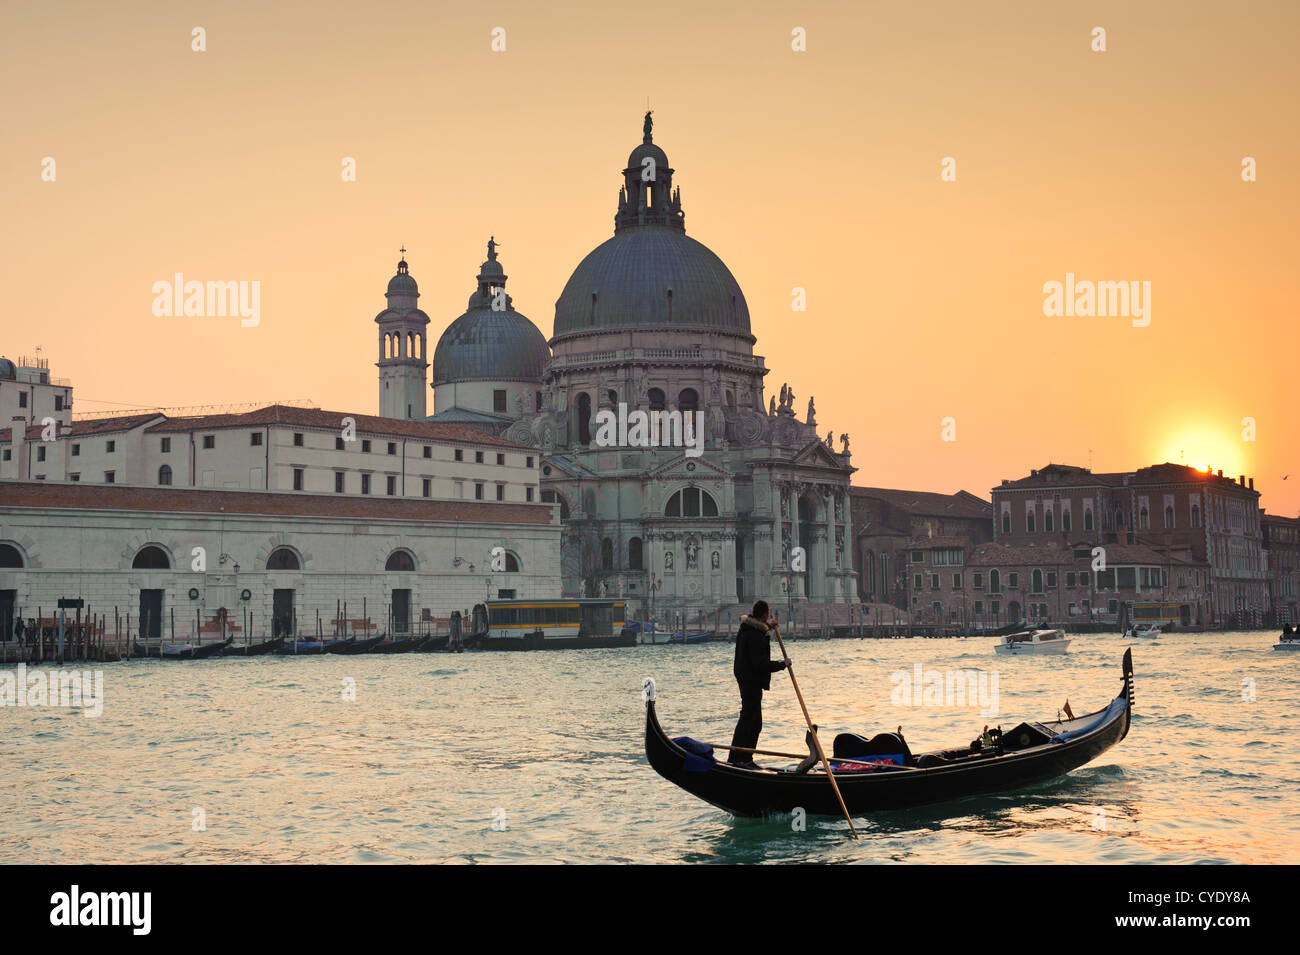 A Gondola in front of the Santa Maria della Salute Church at sunset time, Venice, Veneto, Italy. Stock Photo